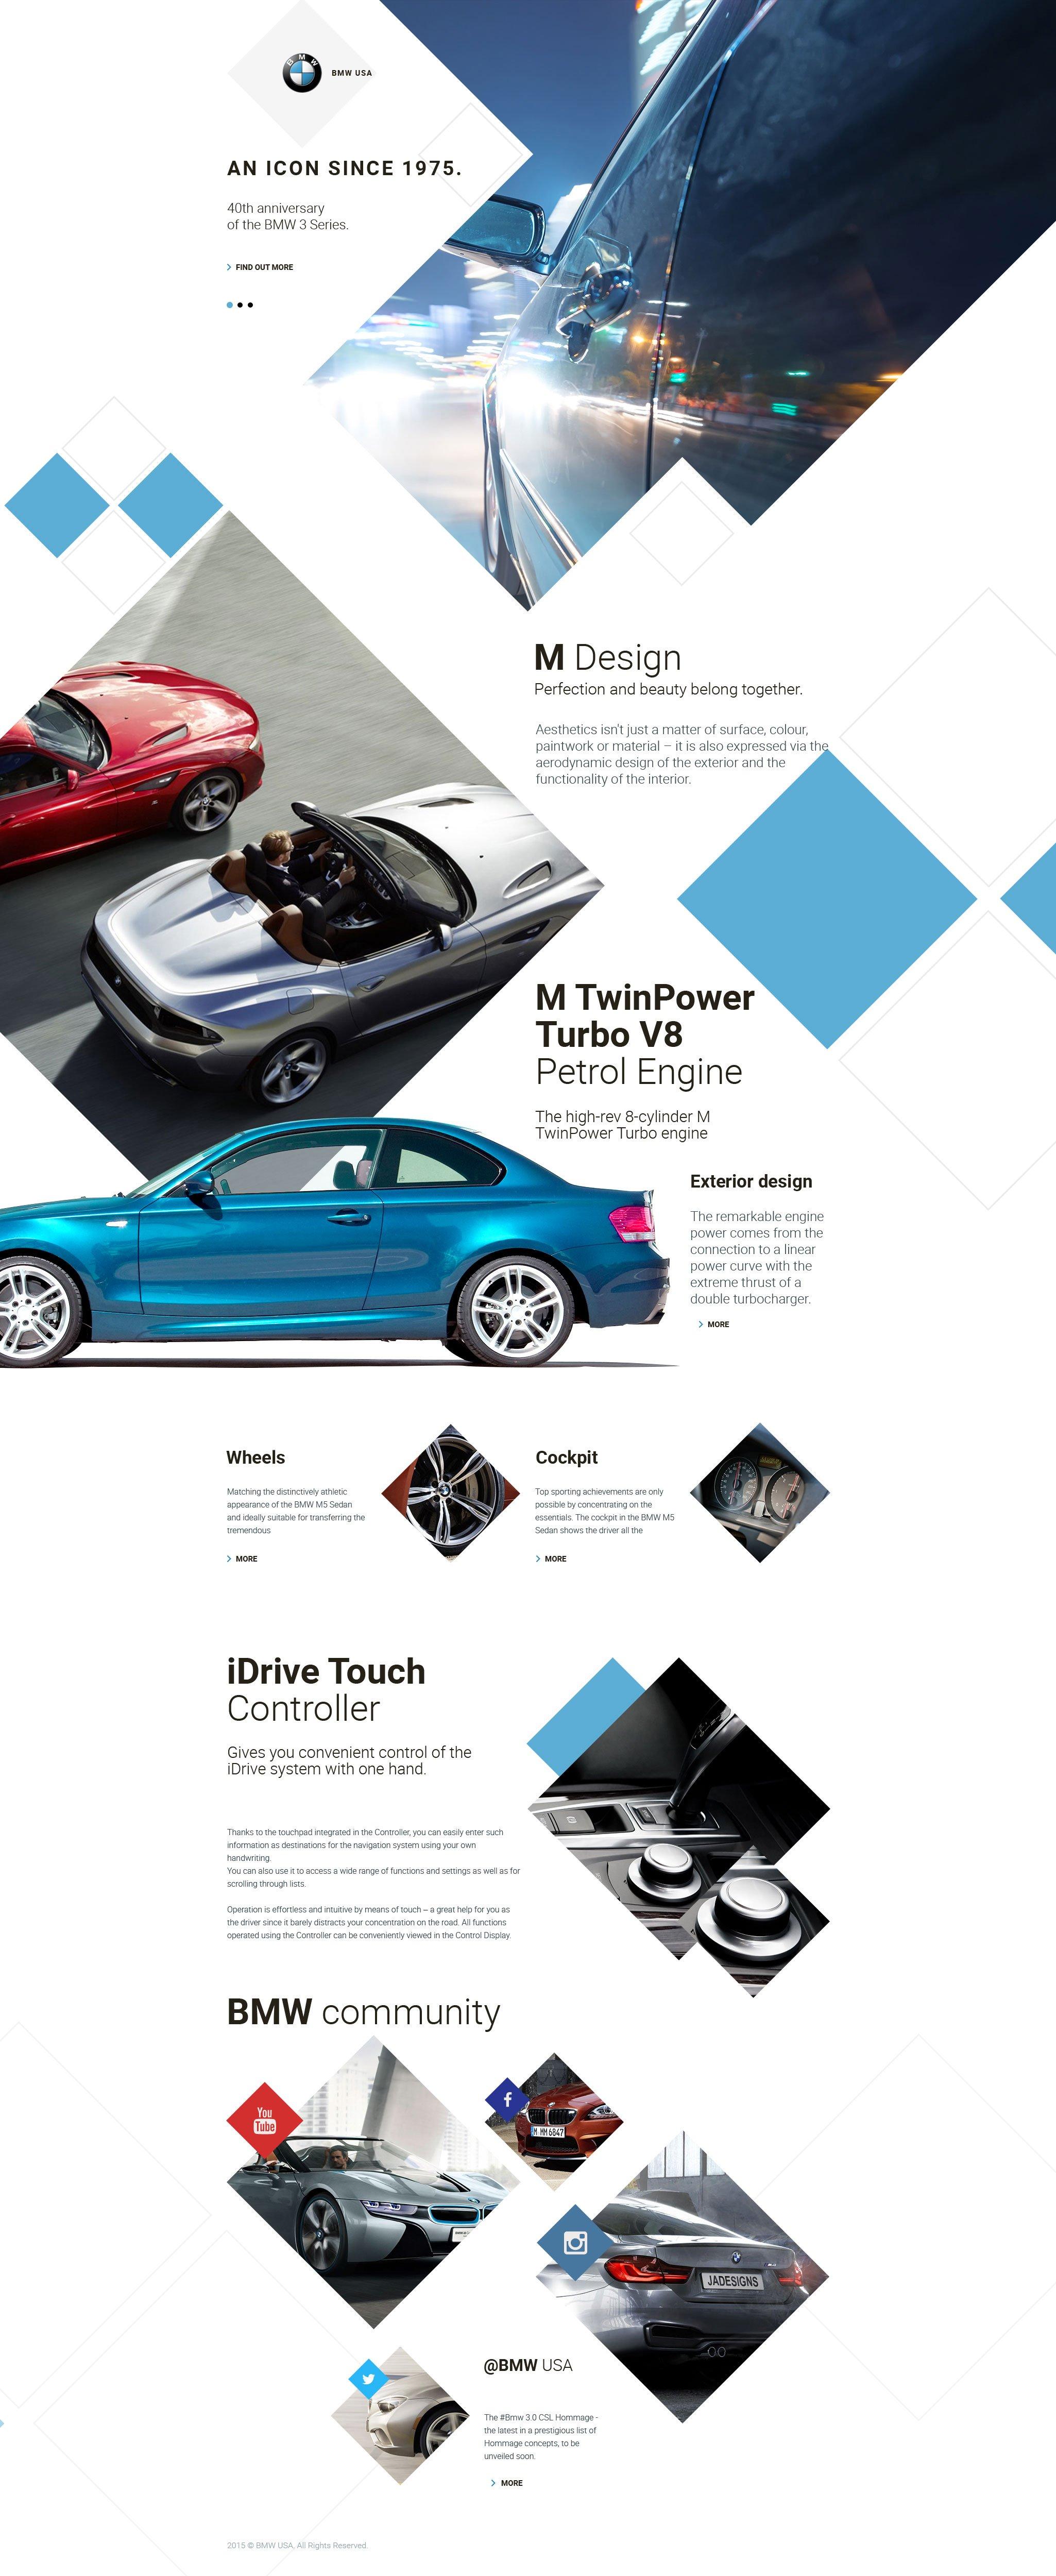 Pagina de coches